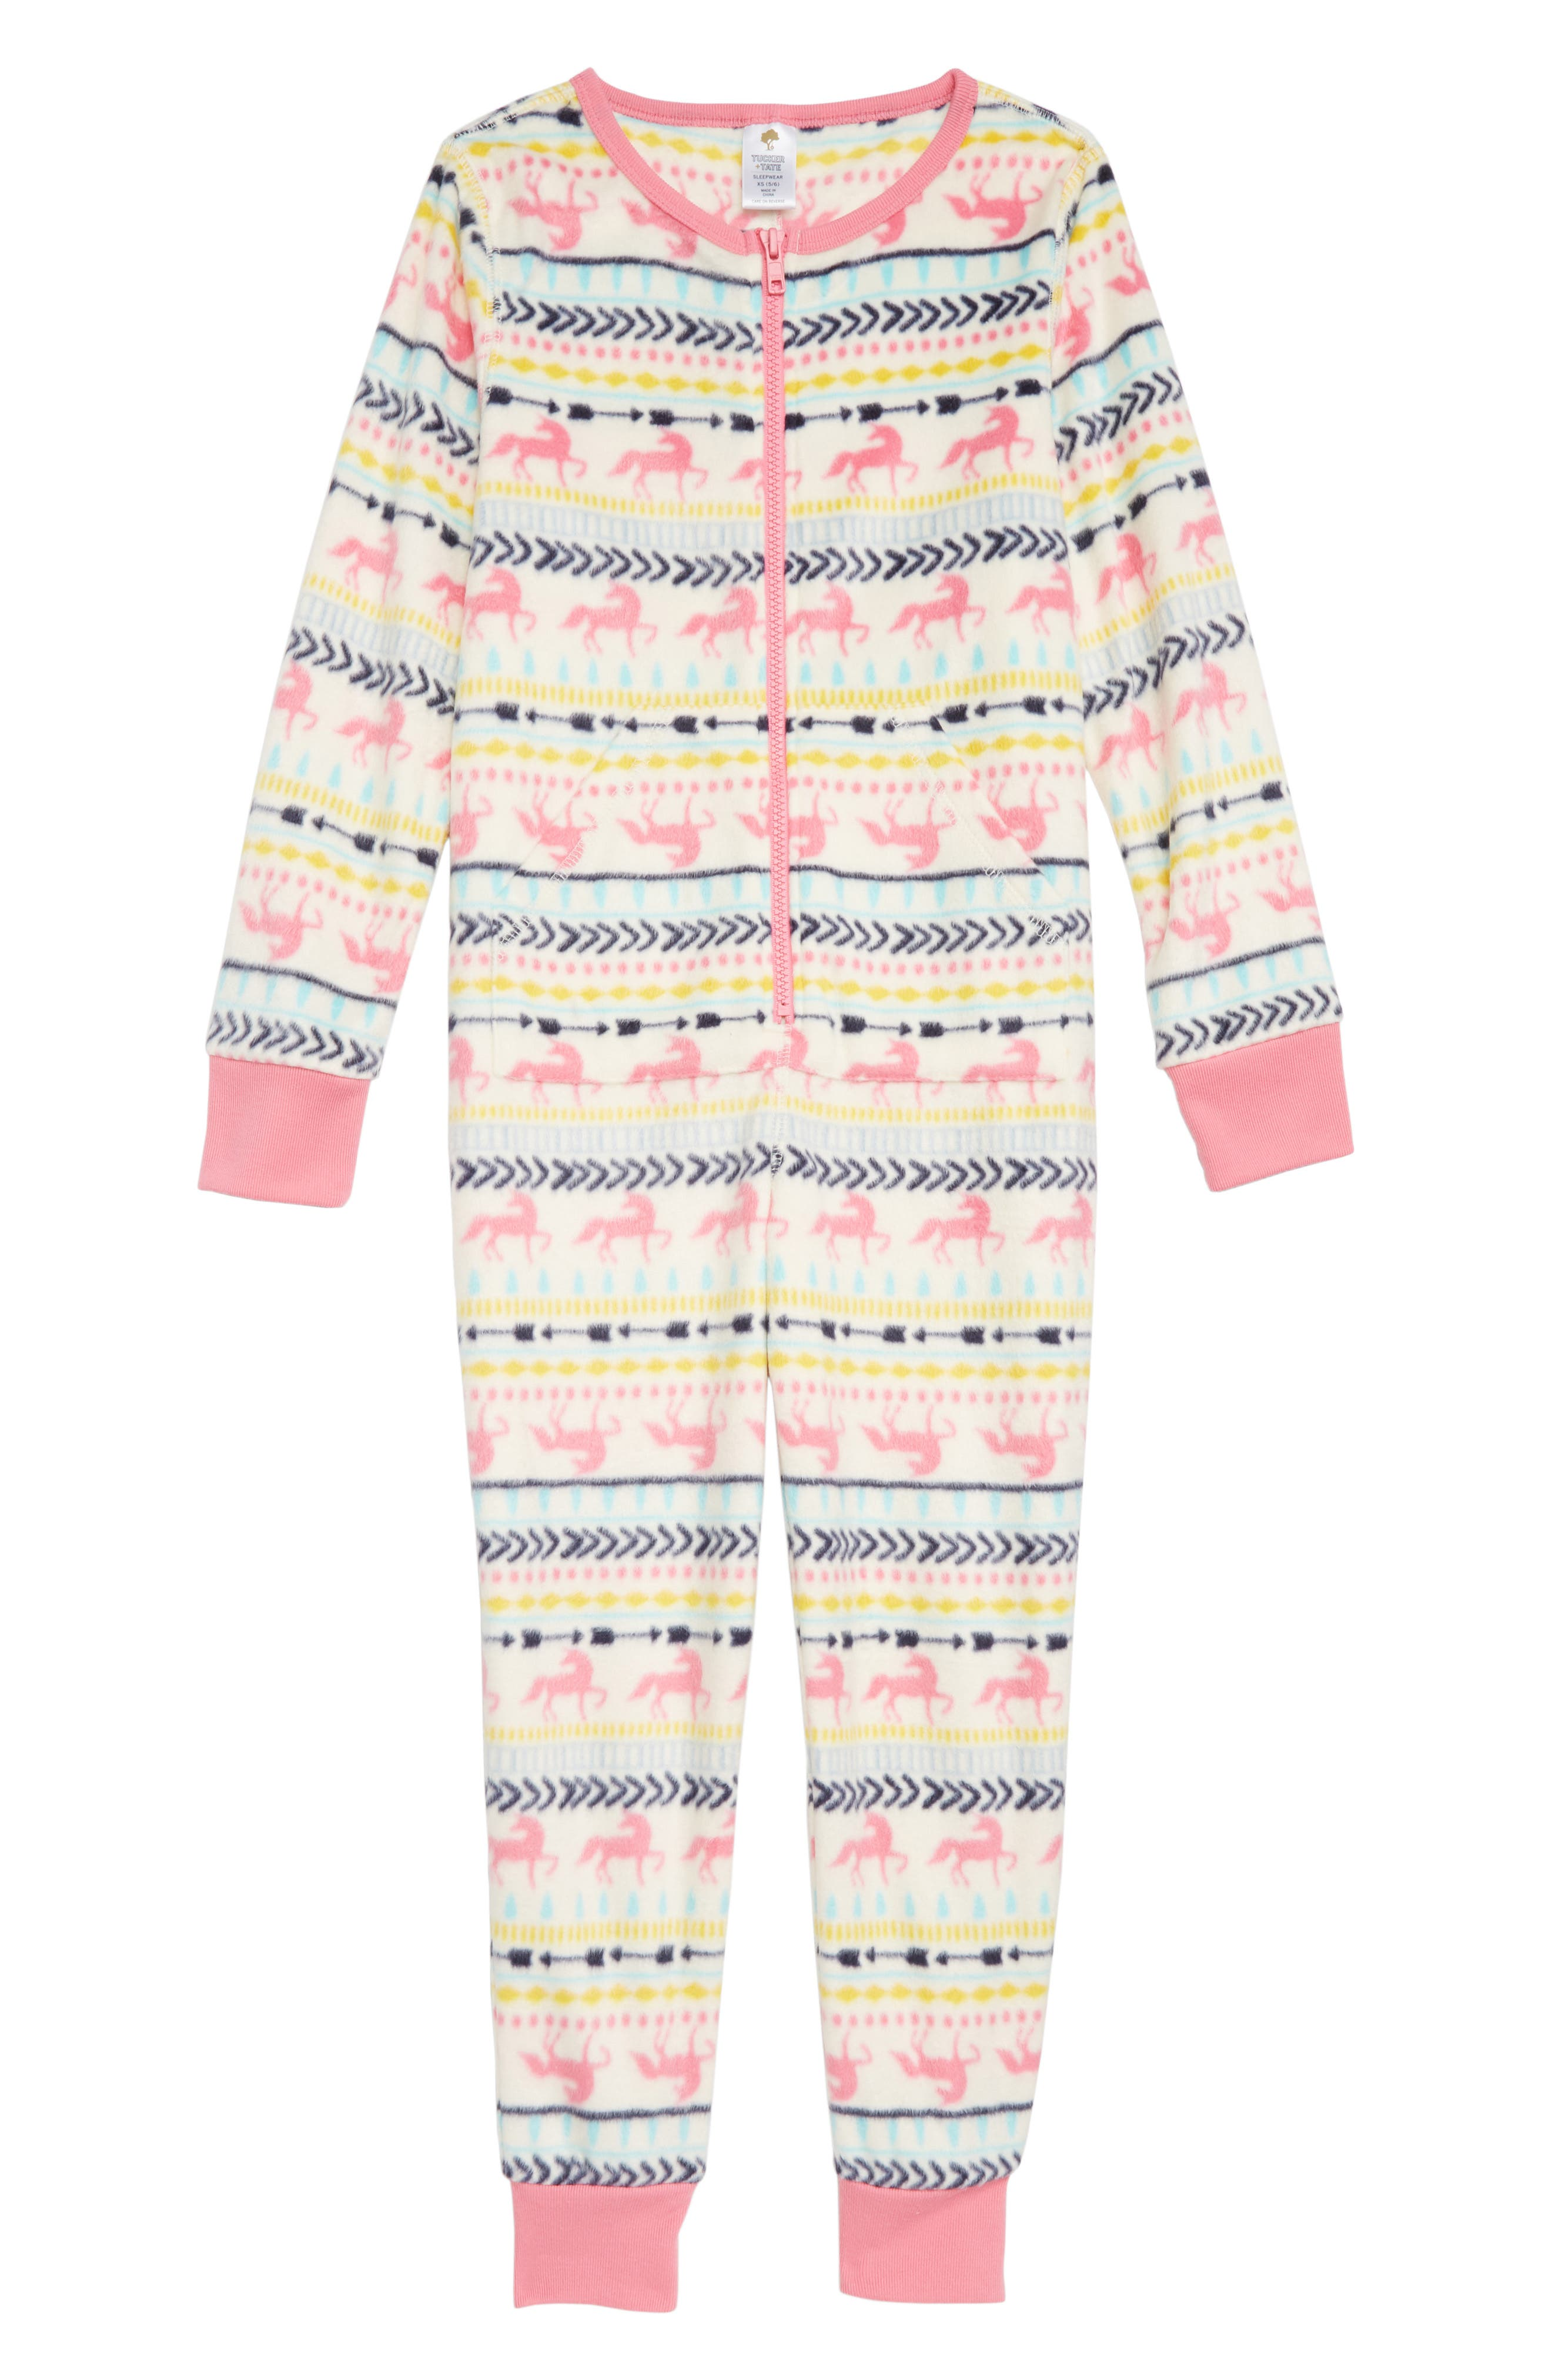 Cozy Print Fitted One-Piece Pajamas, Main, color, IVORY EGRET UNICORN FAIRISLE